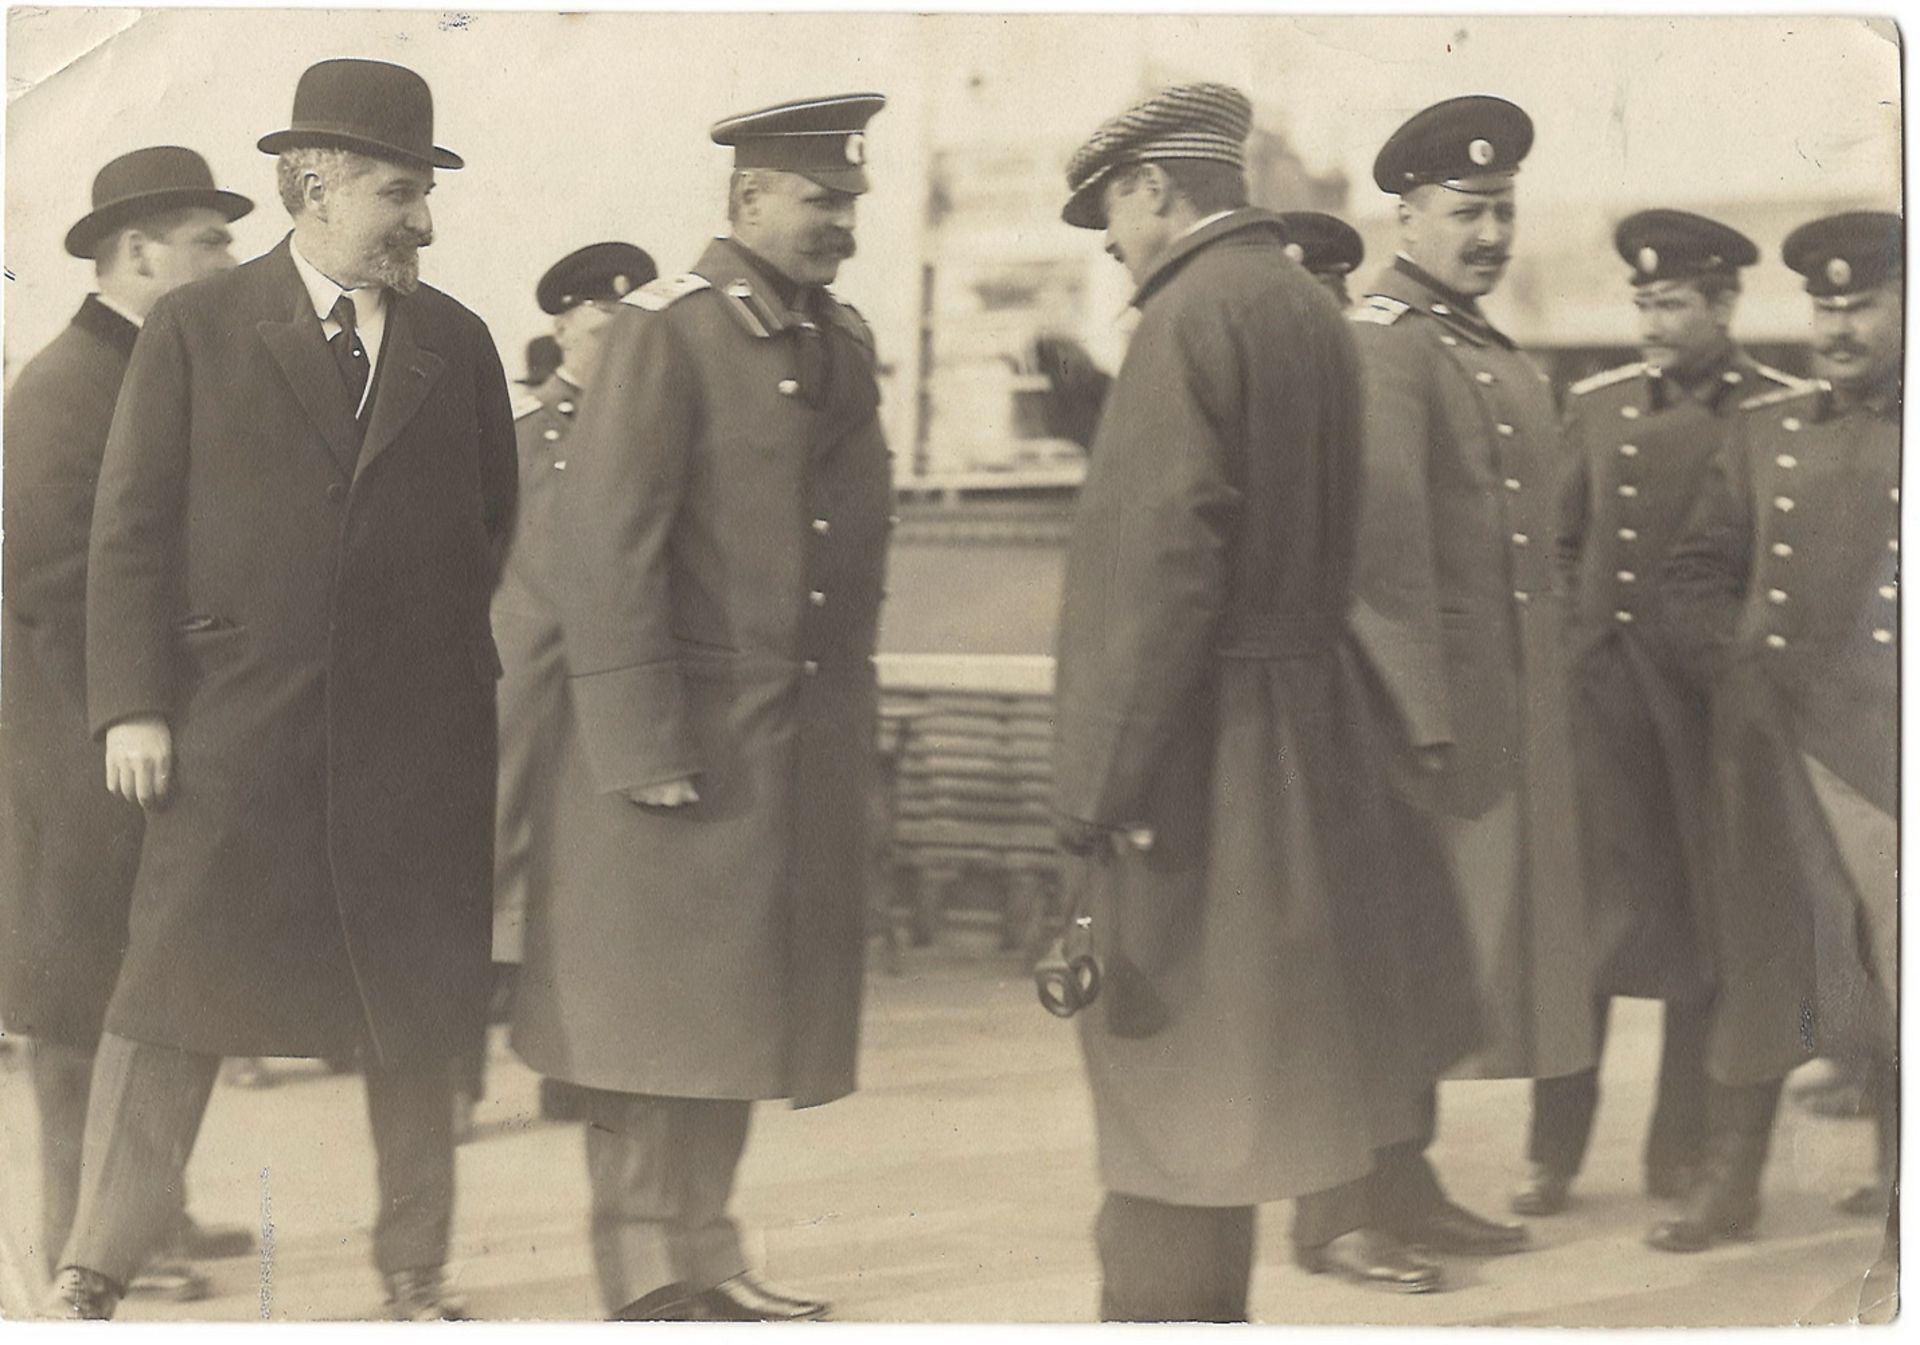 [Russian Empire]. Bulla, K.K. Minister of Internal Affairs V. Dzhunkovsky and aviator A. Gaber-Vlyns